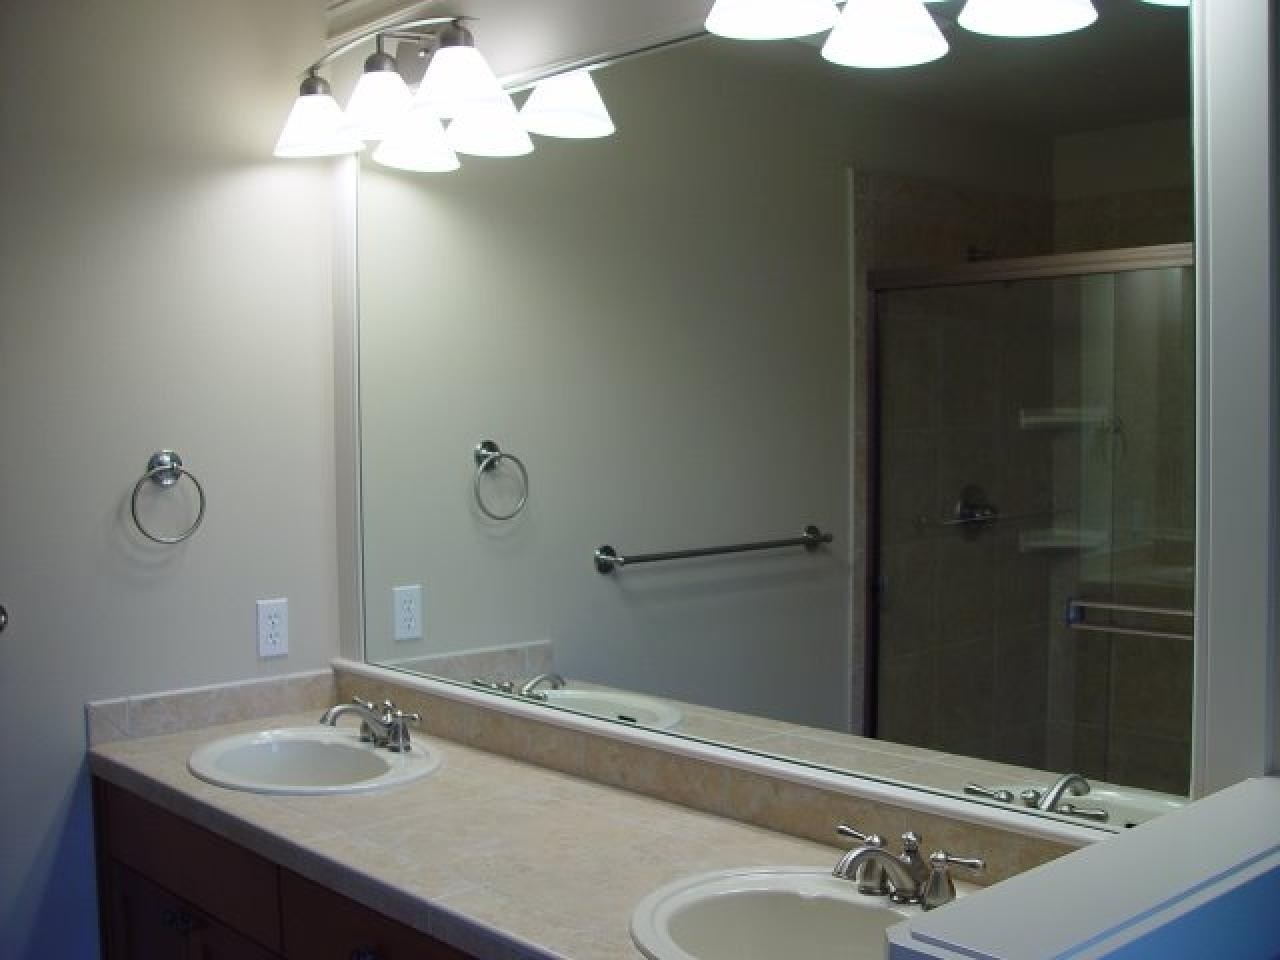 Bathrooms Design : Vanity Bathroom Sinks Menards Mirrors Medicine Pertaining To Bevelled Bathroom Mirrors (Image 10 of 20)